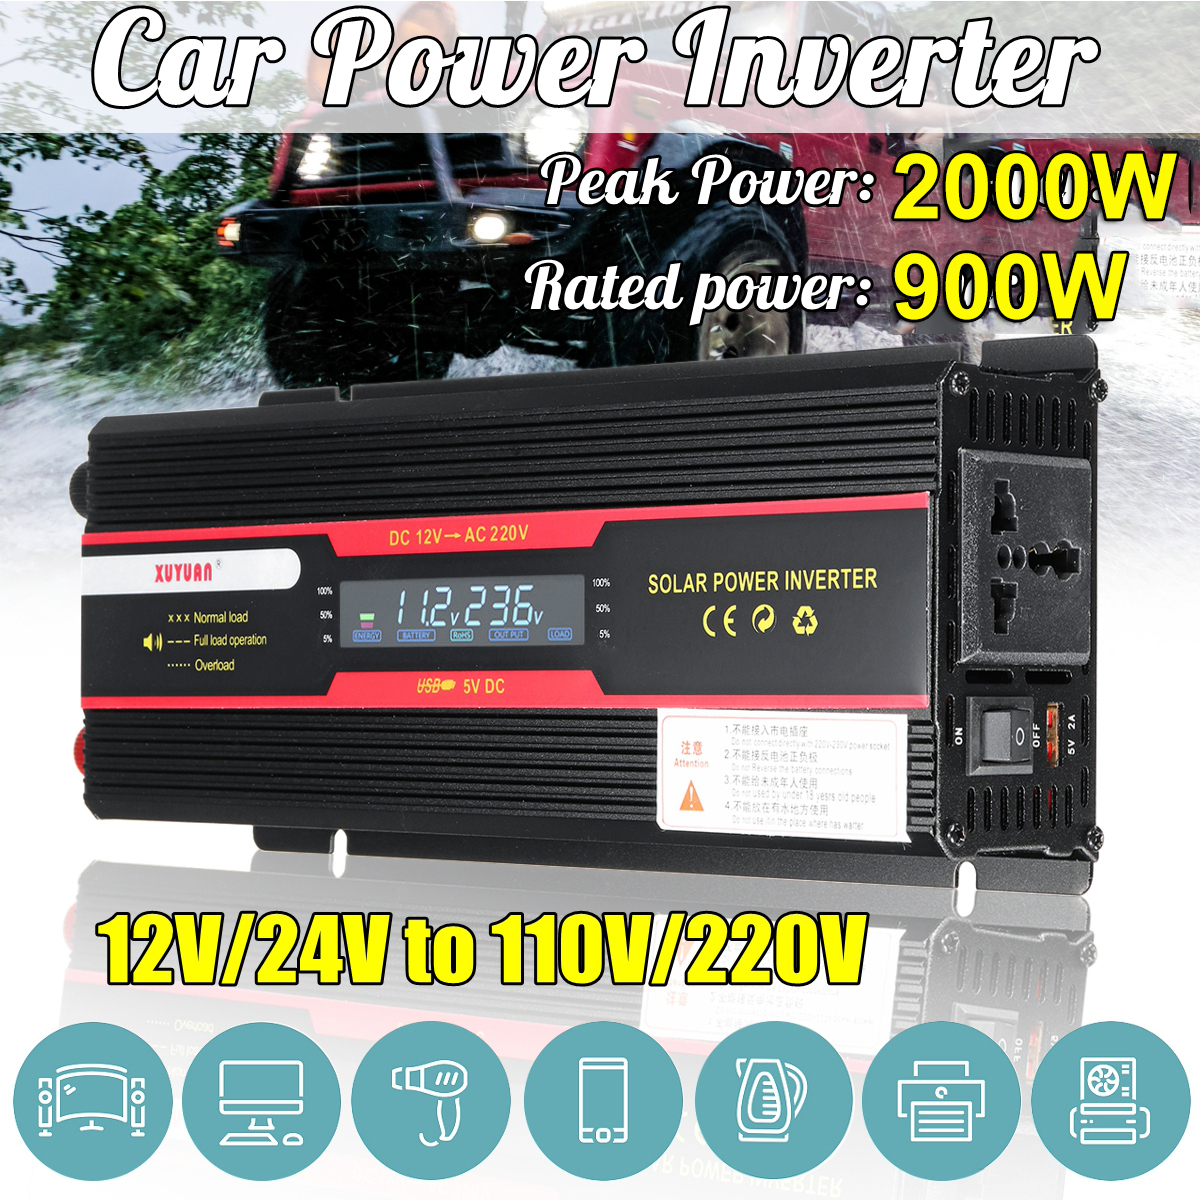 Car Inverter 12V 220V 2000W Pea k Power Inverter Voltage Convertor Transformer DC 12V/24V To AC 220V/110V Solar Inversor LCD 1pcs lot sh b17 50w 220v to 110v 110v to 220v